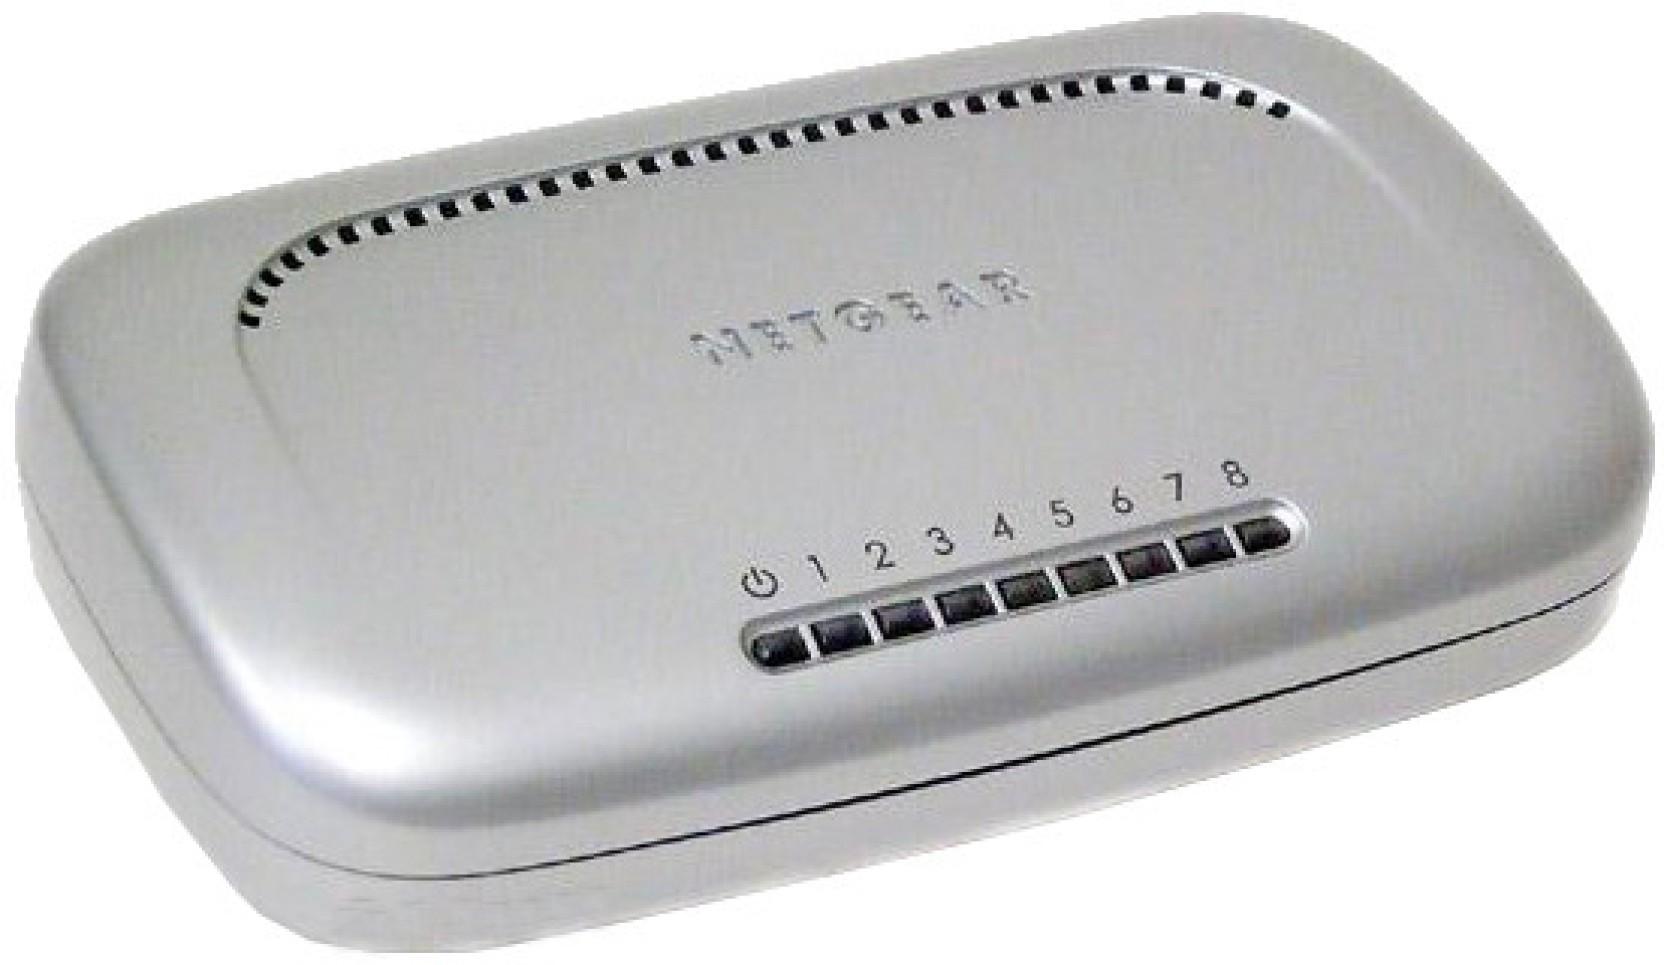 Netgear Fs608 Network Switch Castello Keyboard Mouse Usb Share